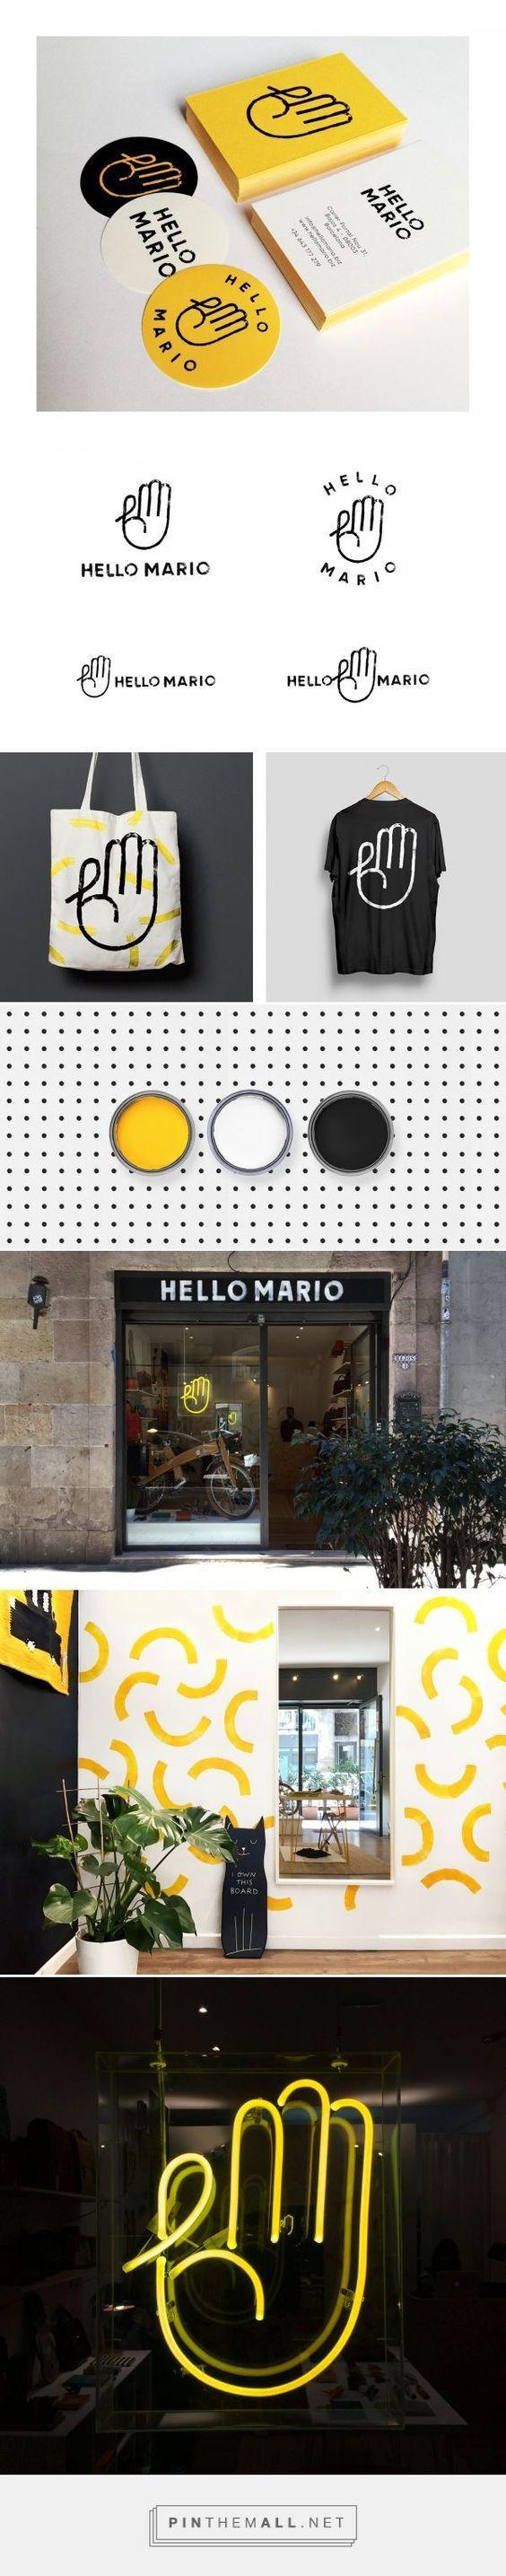 (35) Hello Mario Branding by Min / Branding / Ideas